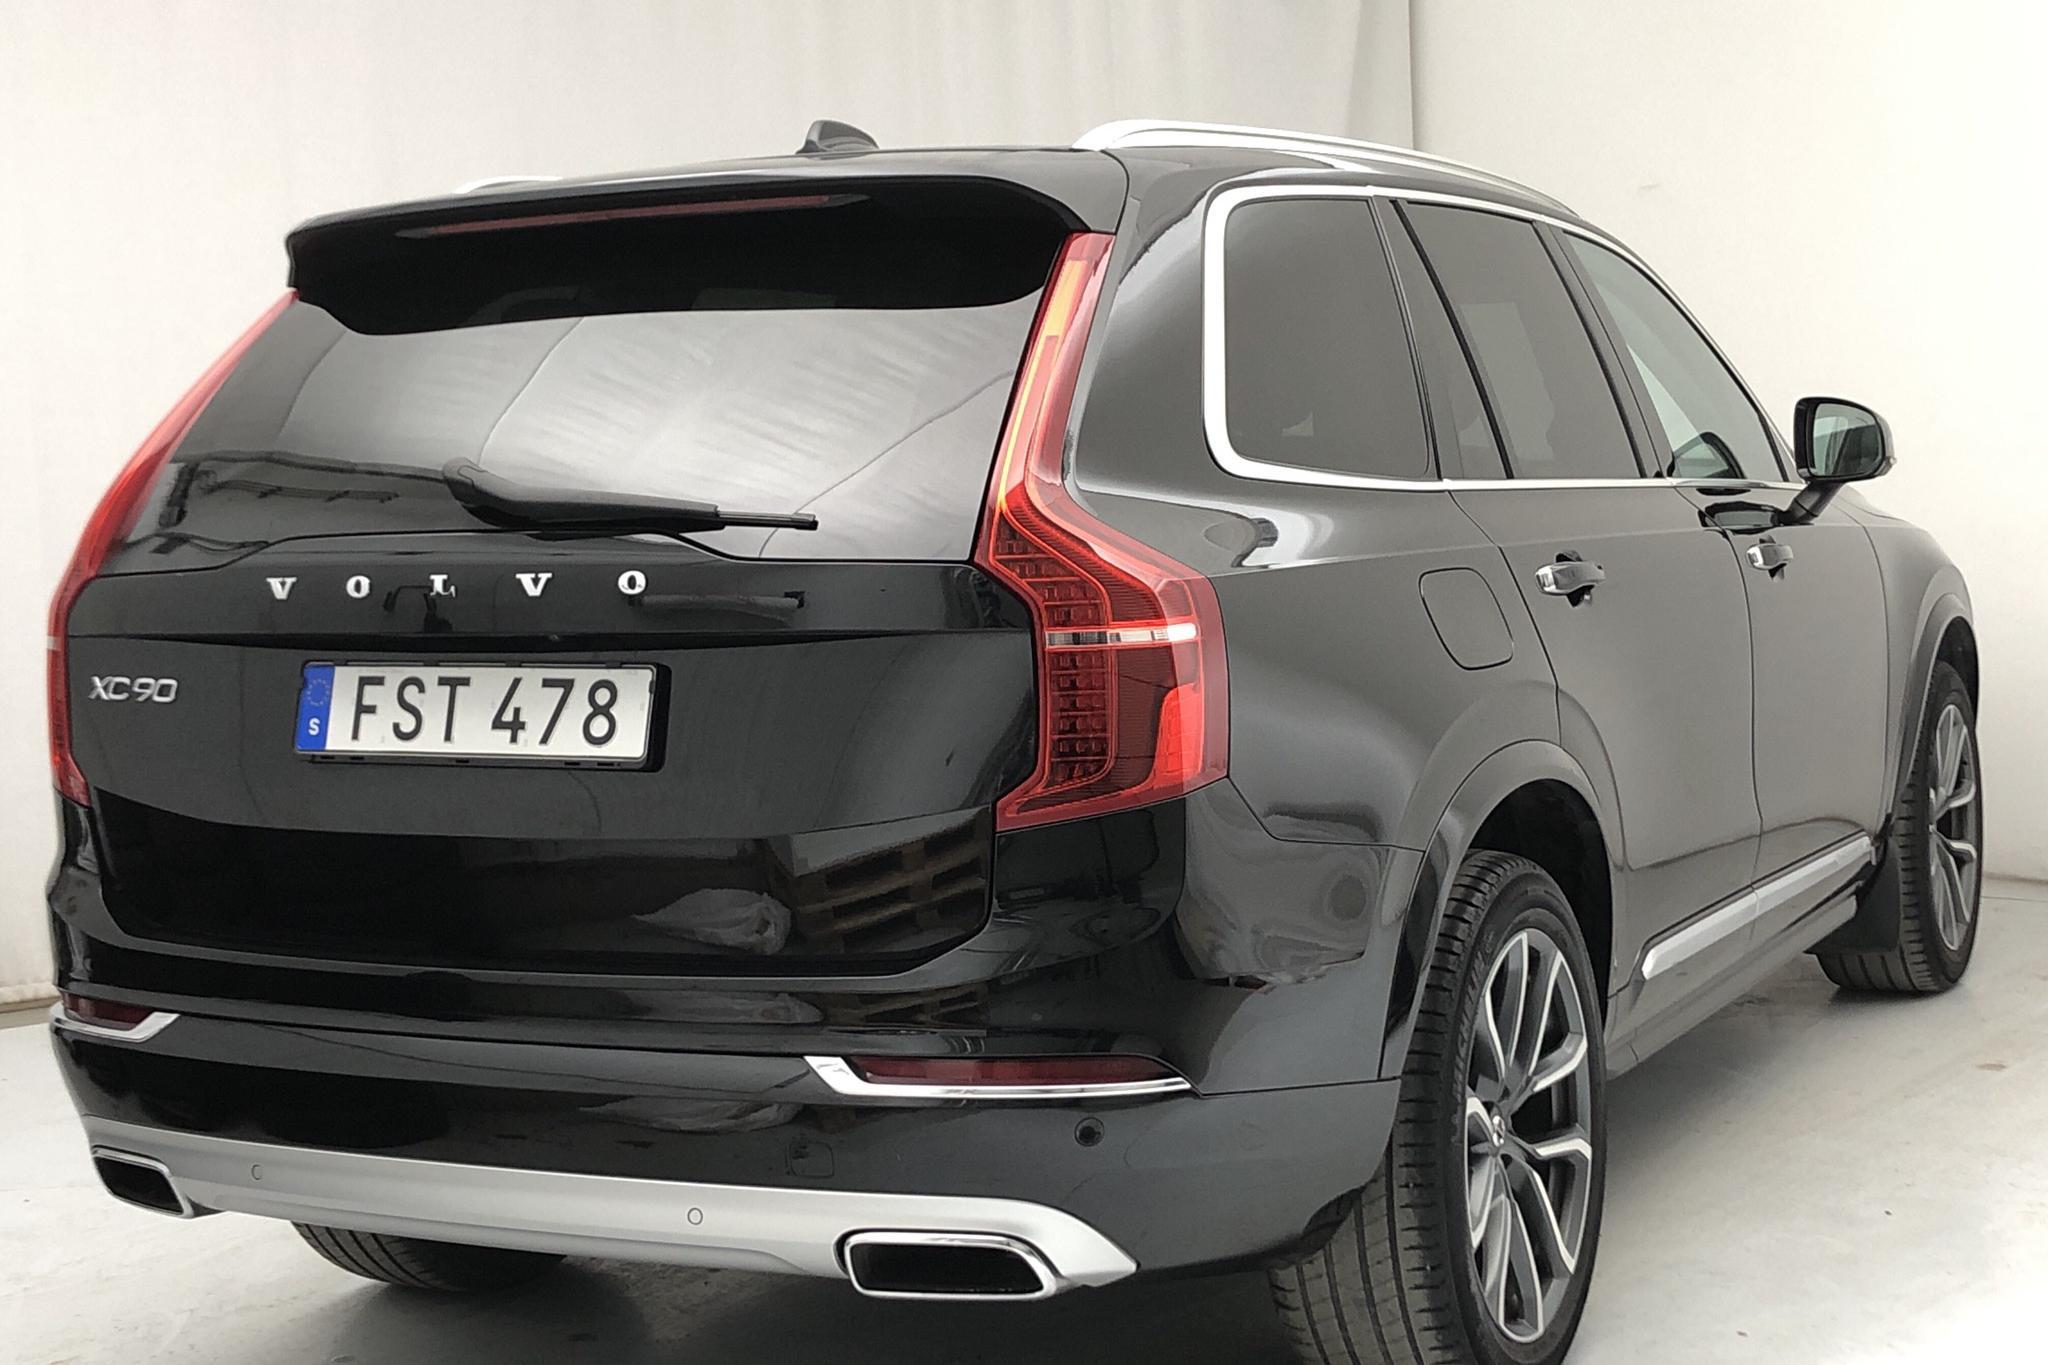 Volvo XC90 D4 AWD (190hk) - 82 100 km - Automatic - black - 2018